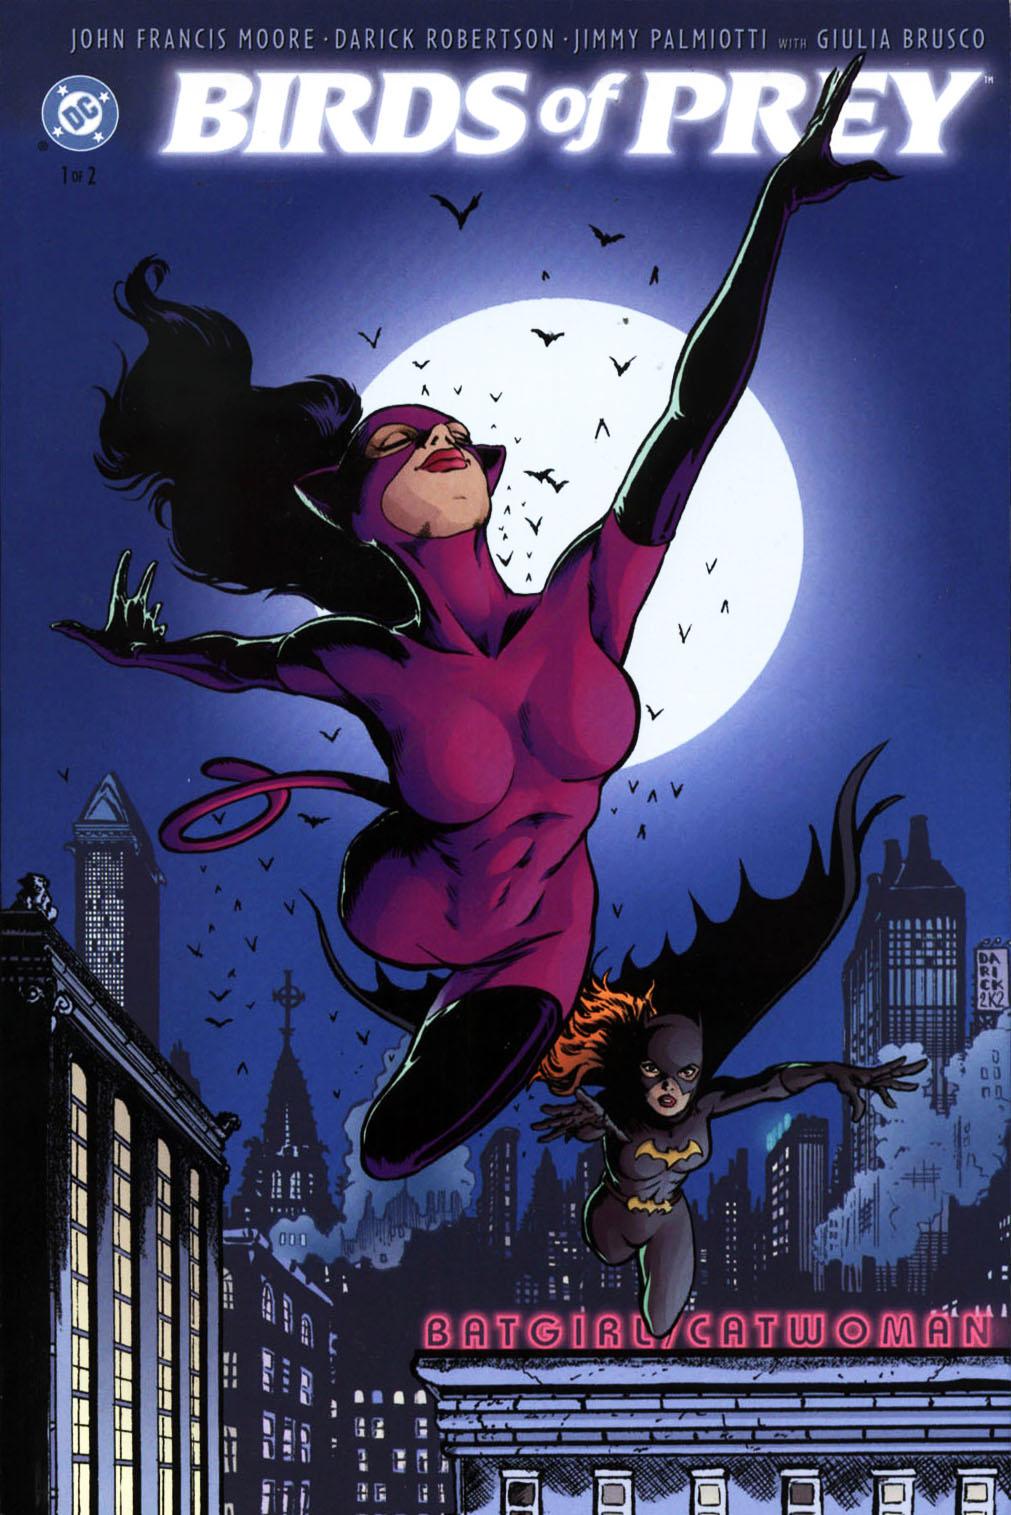 Birds Of Prey - Batgirl-Catwoman 1-00fc.jpg